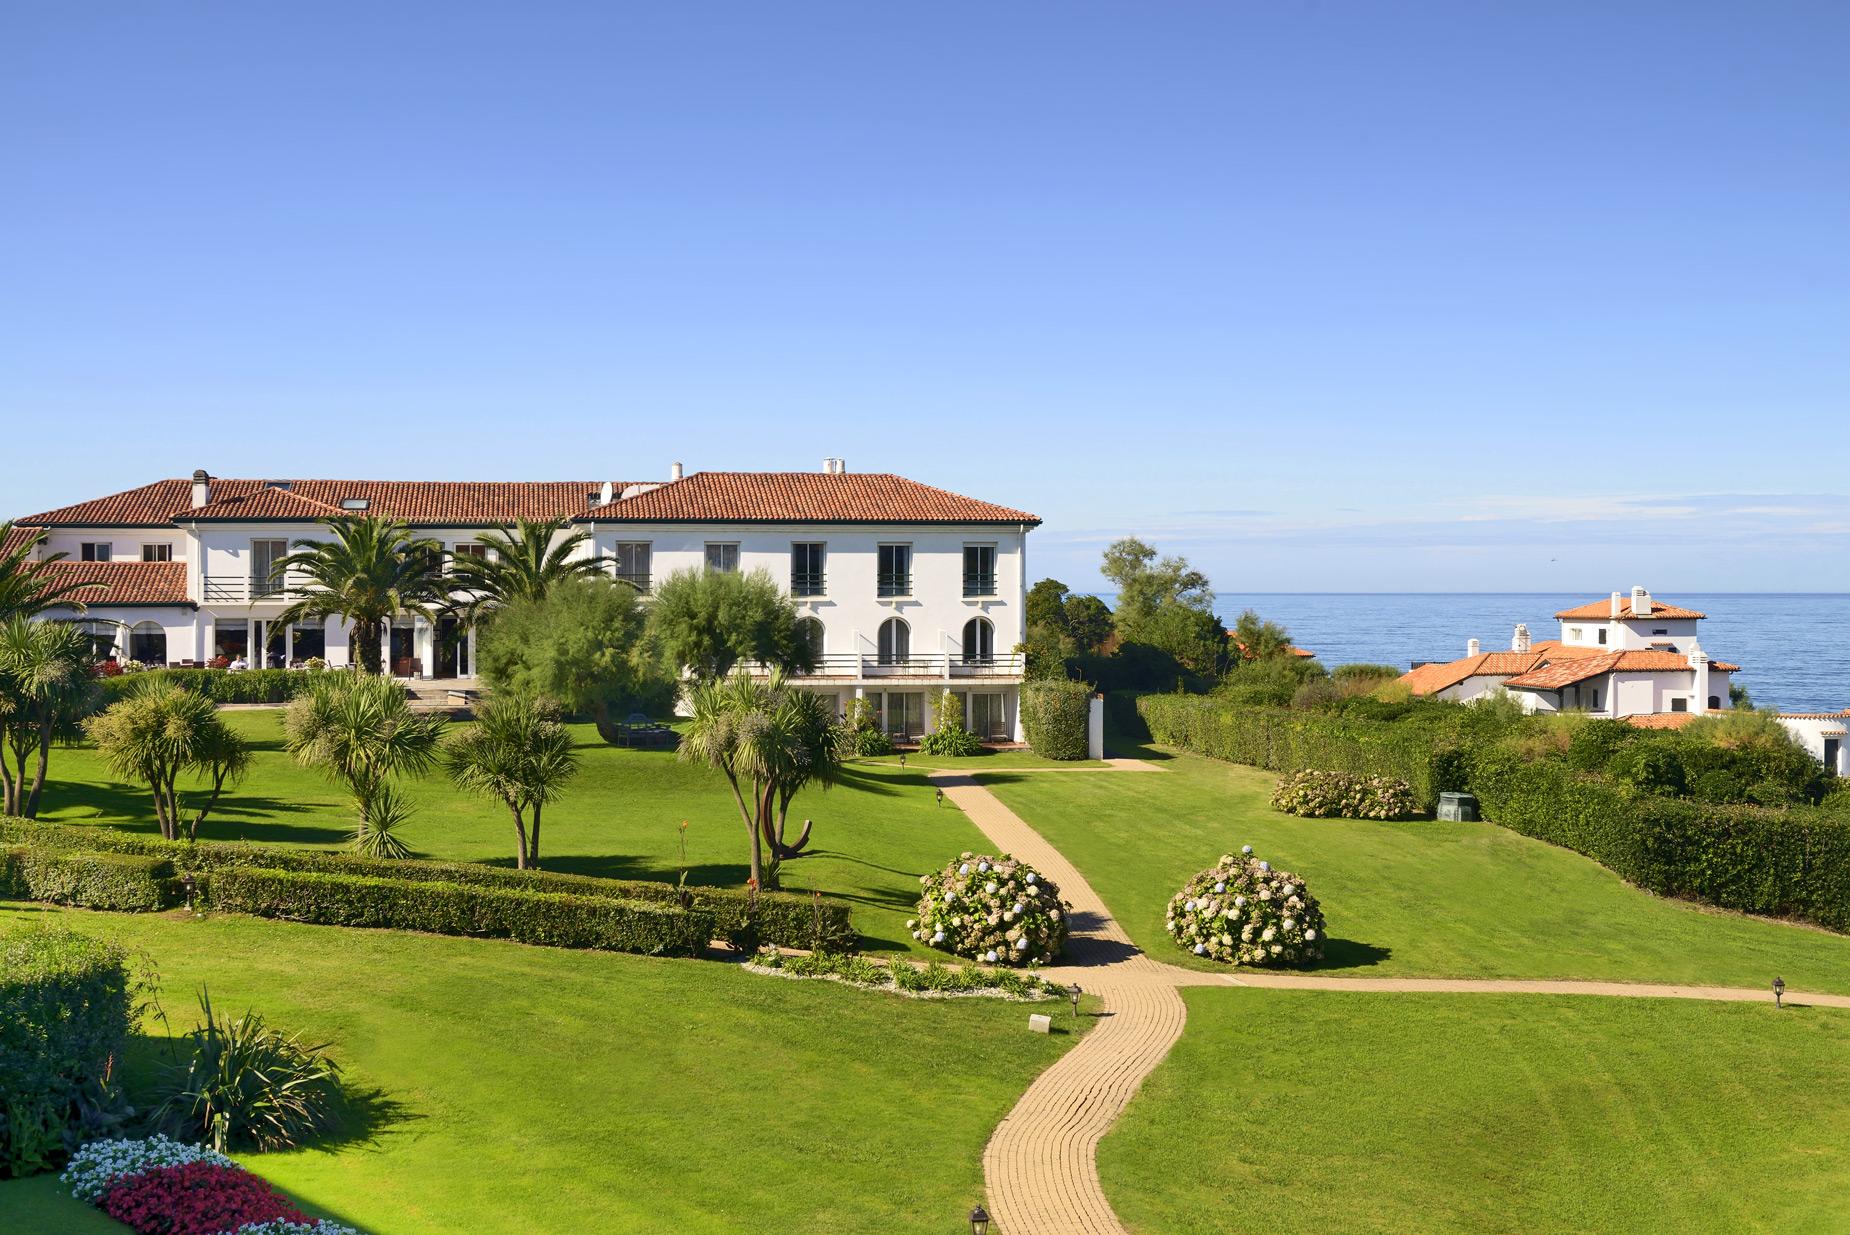 lareserve-hotel-saintjeandeluz-pays-basque